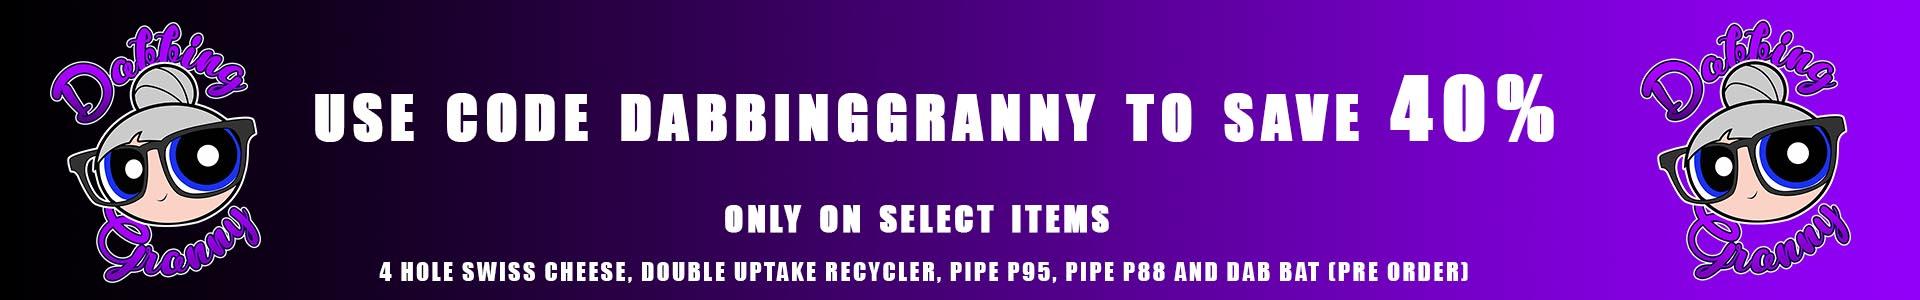 dabbing-granny-sale.jpg